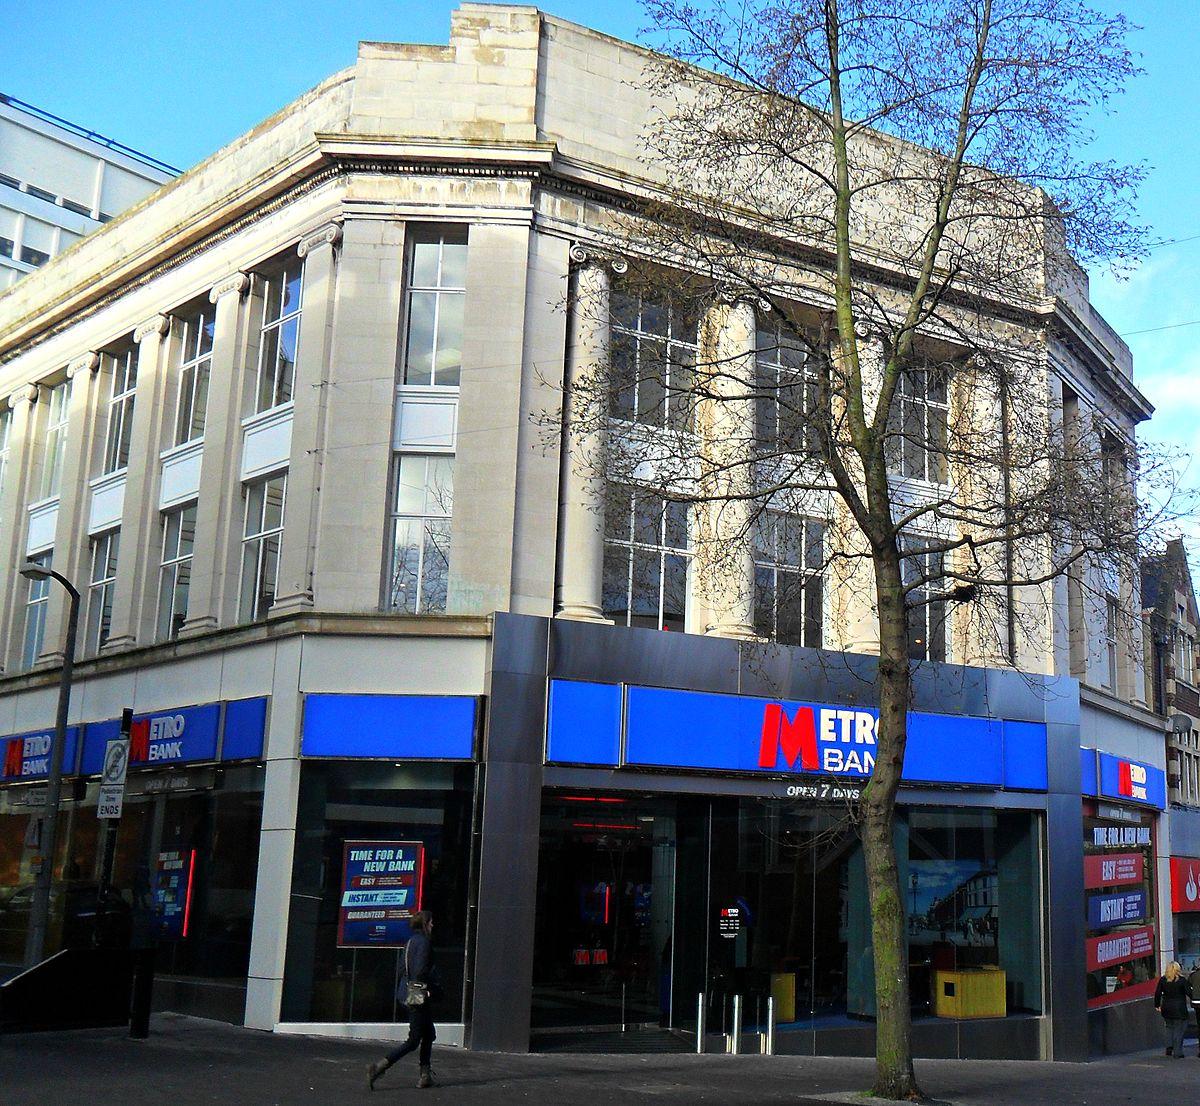 Metro Bank (United Kingdom)